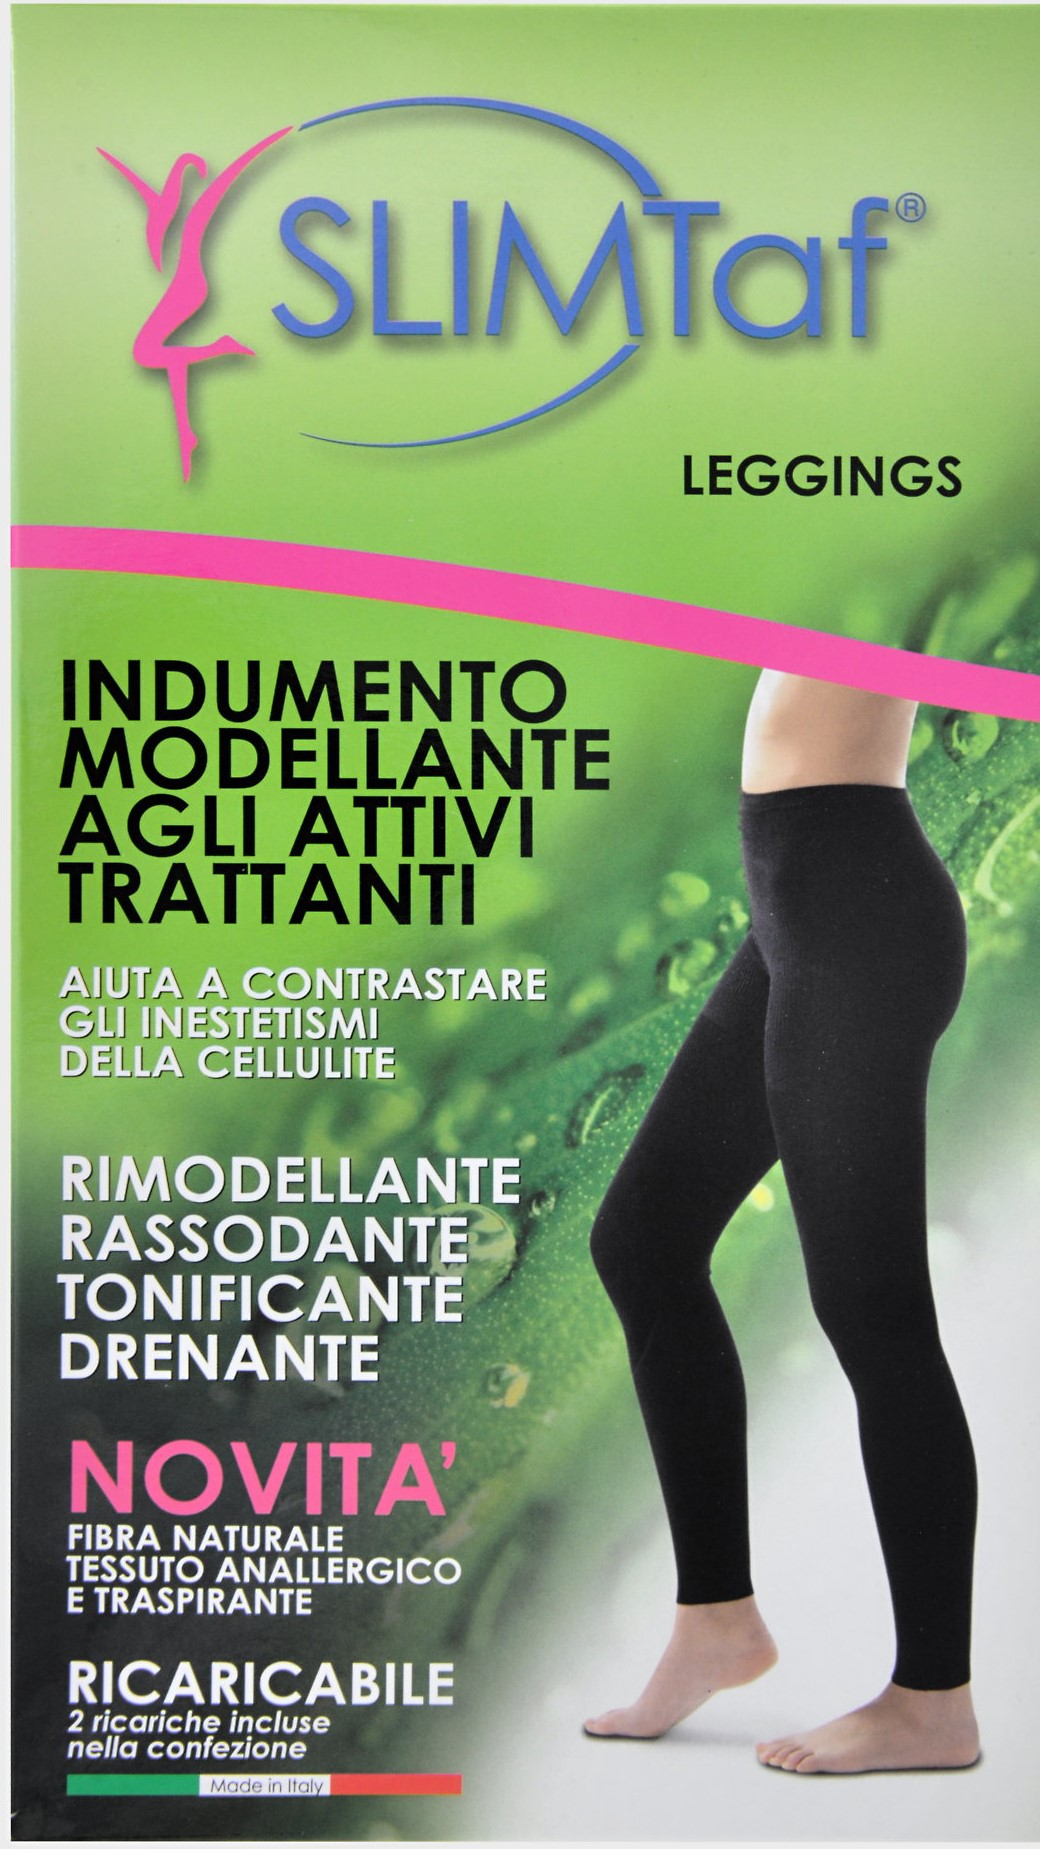 Image of Calzificio Franzoni G.Mauro Slimtaf Leggings Modellante M 922930247